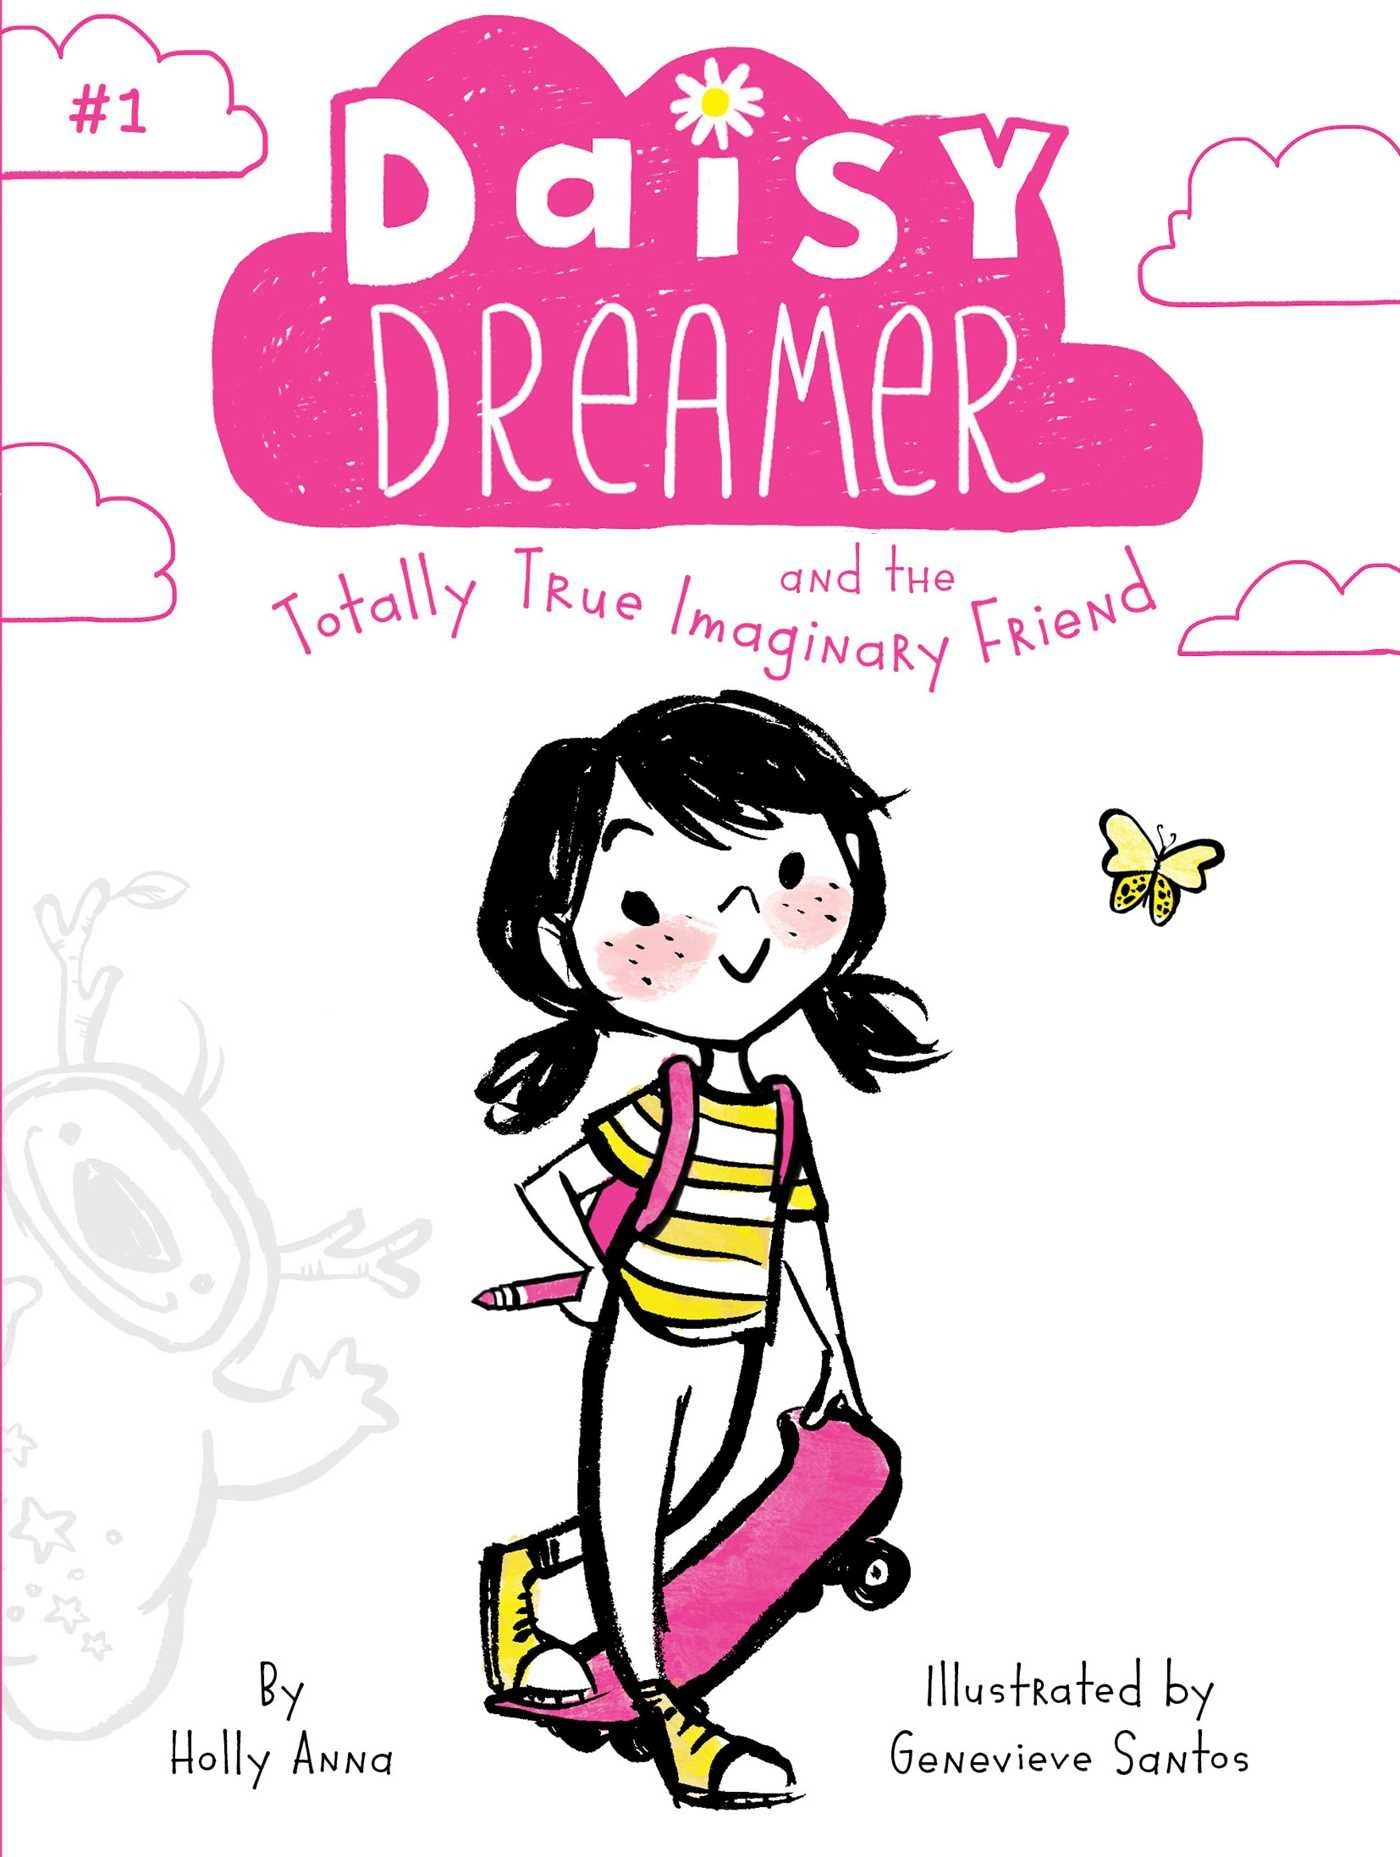 DaisyDreamer_book1.jpg